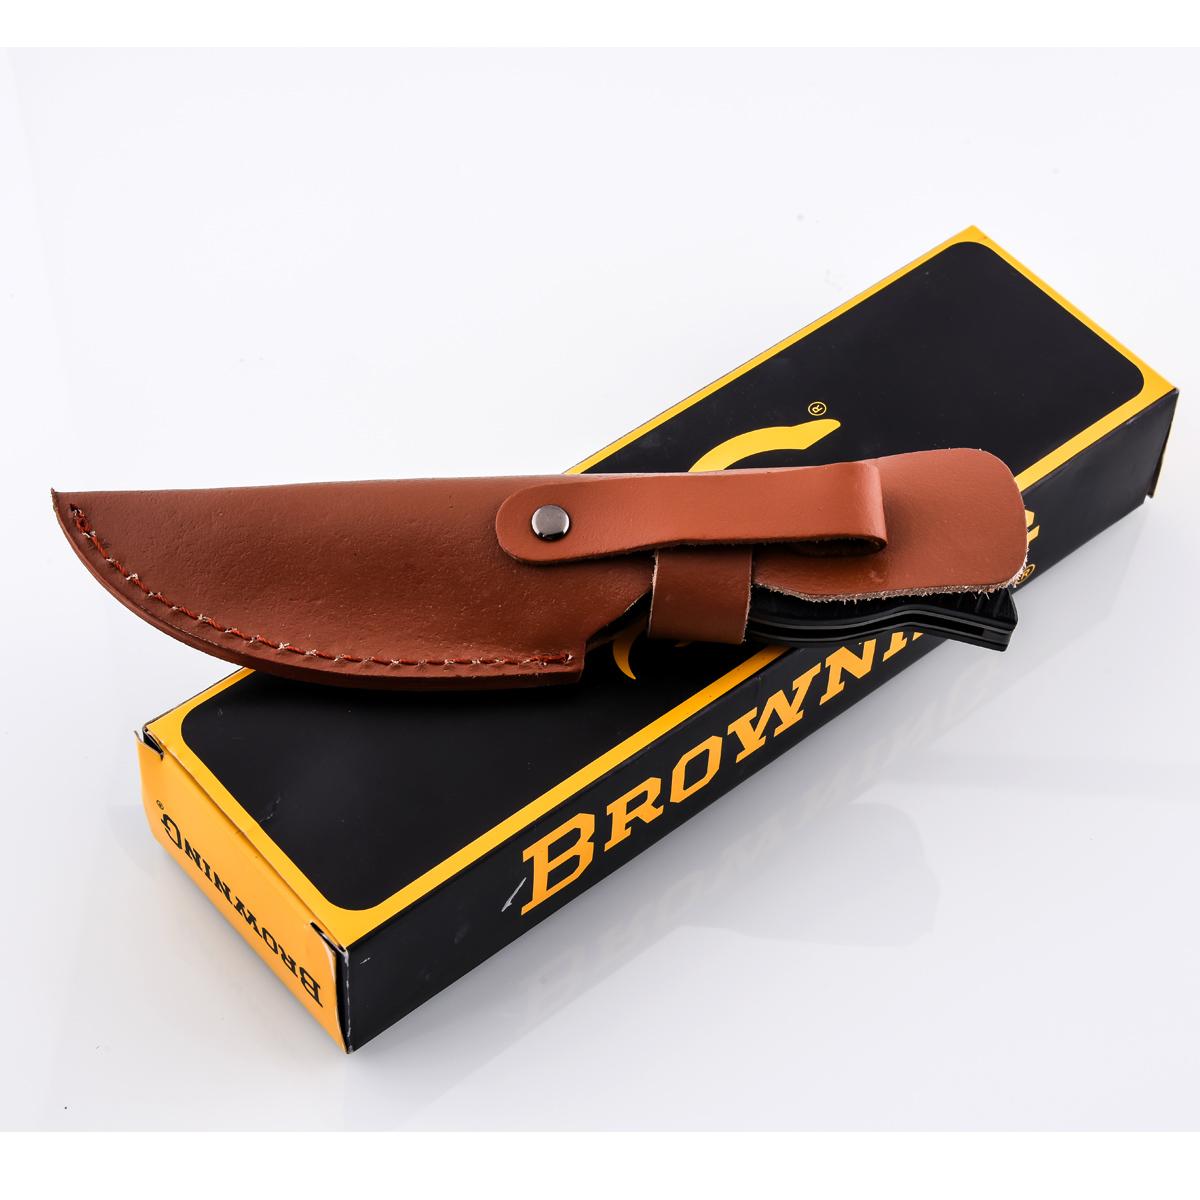 Нож Browning с доставкой